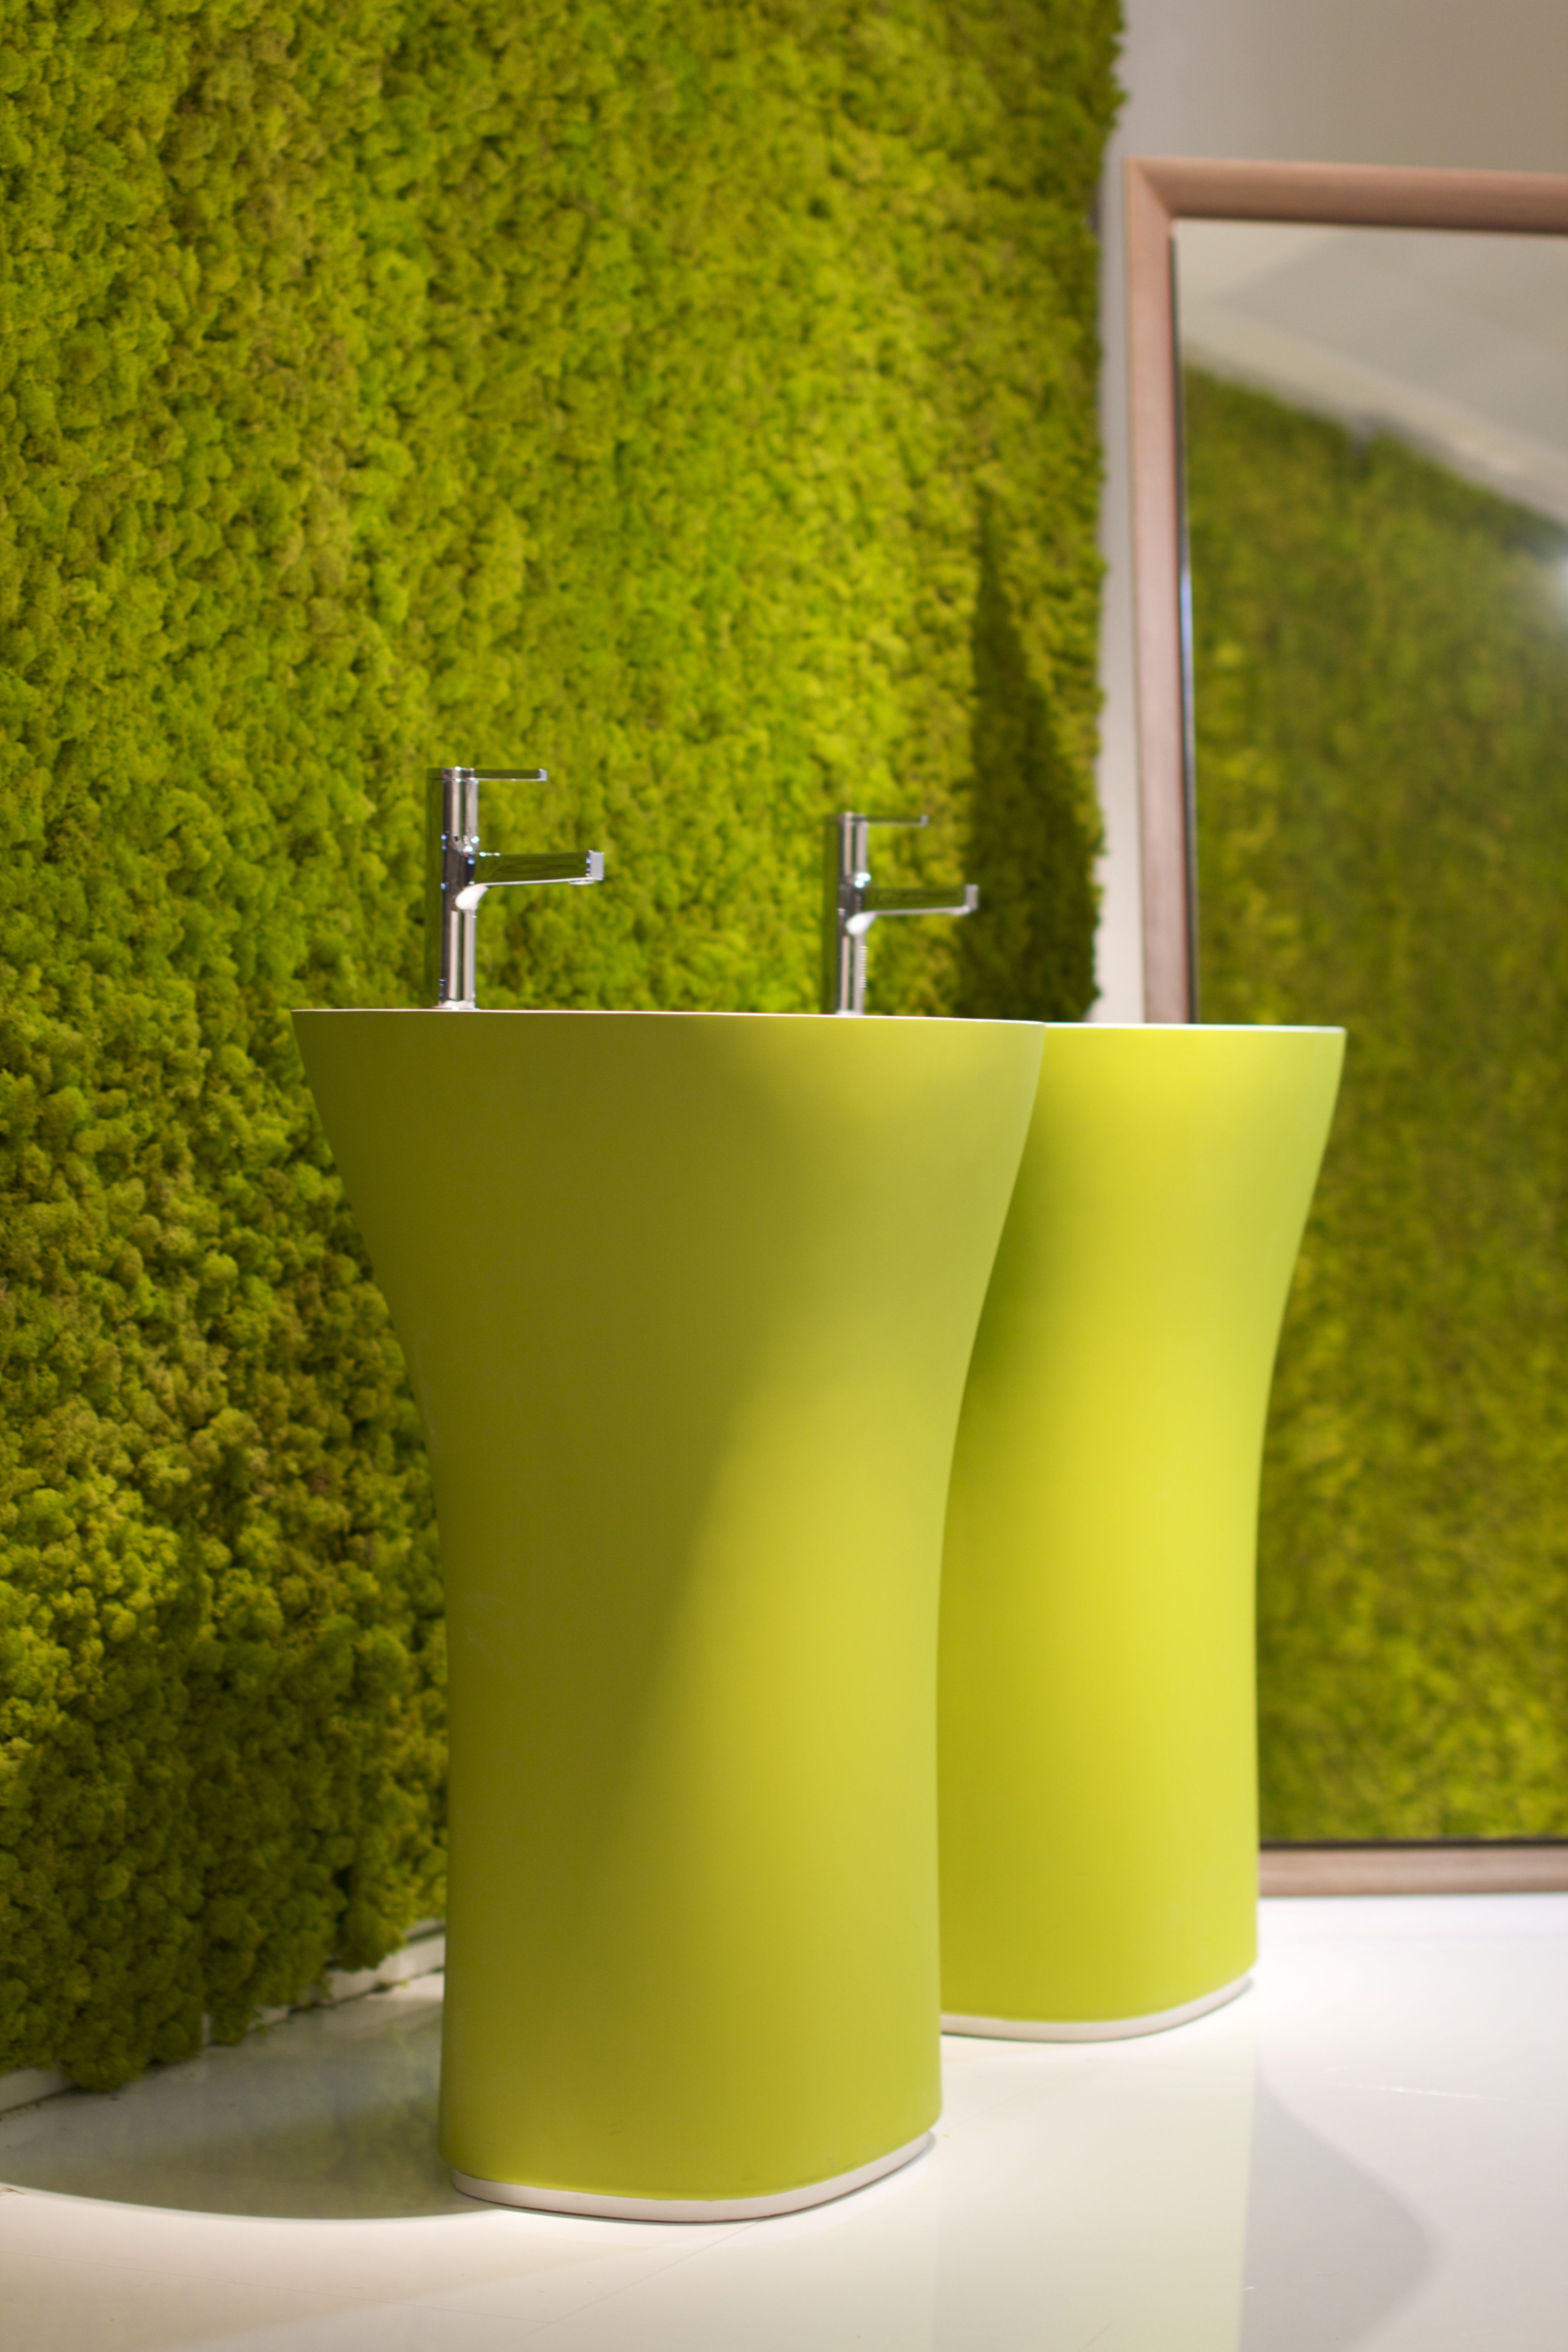 Mur Vegetal Salle De Bain | Mur Vegetal Interieur Kit